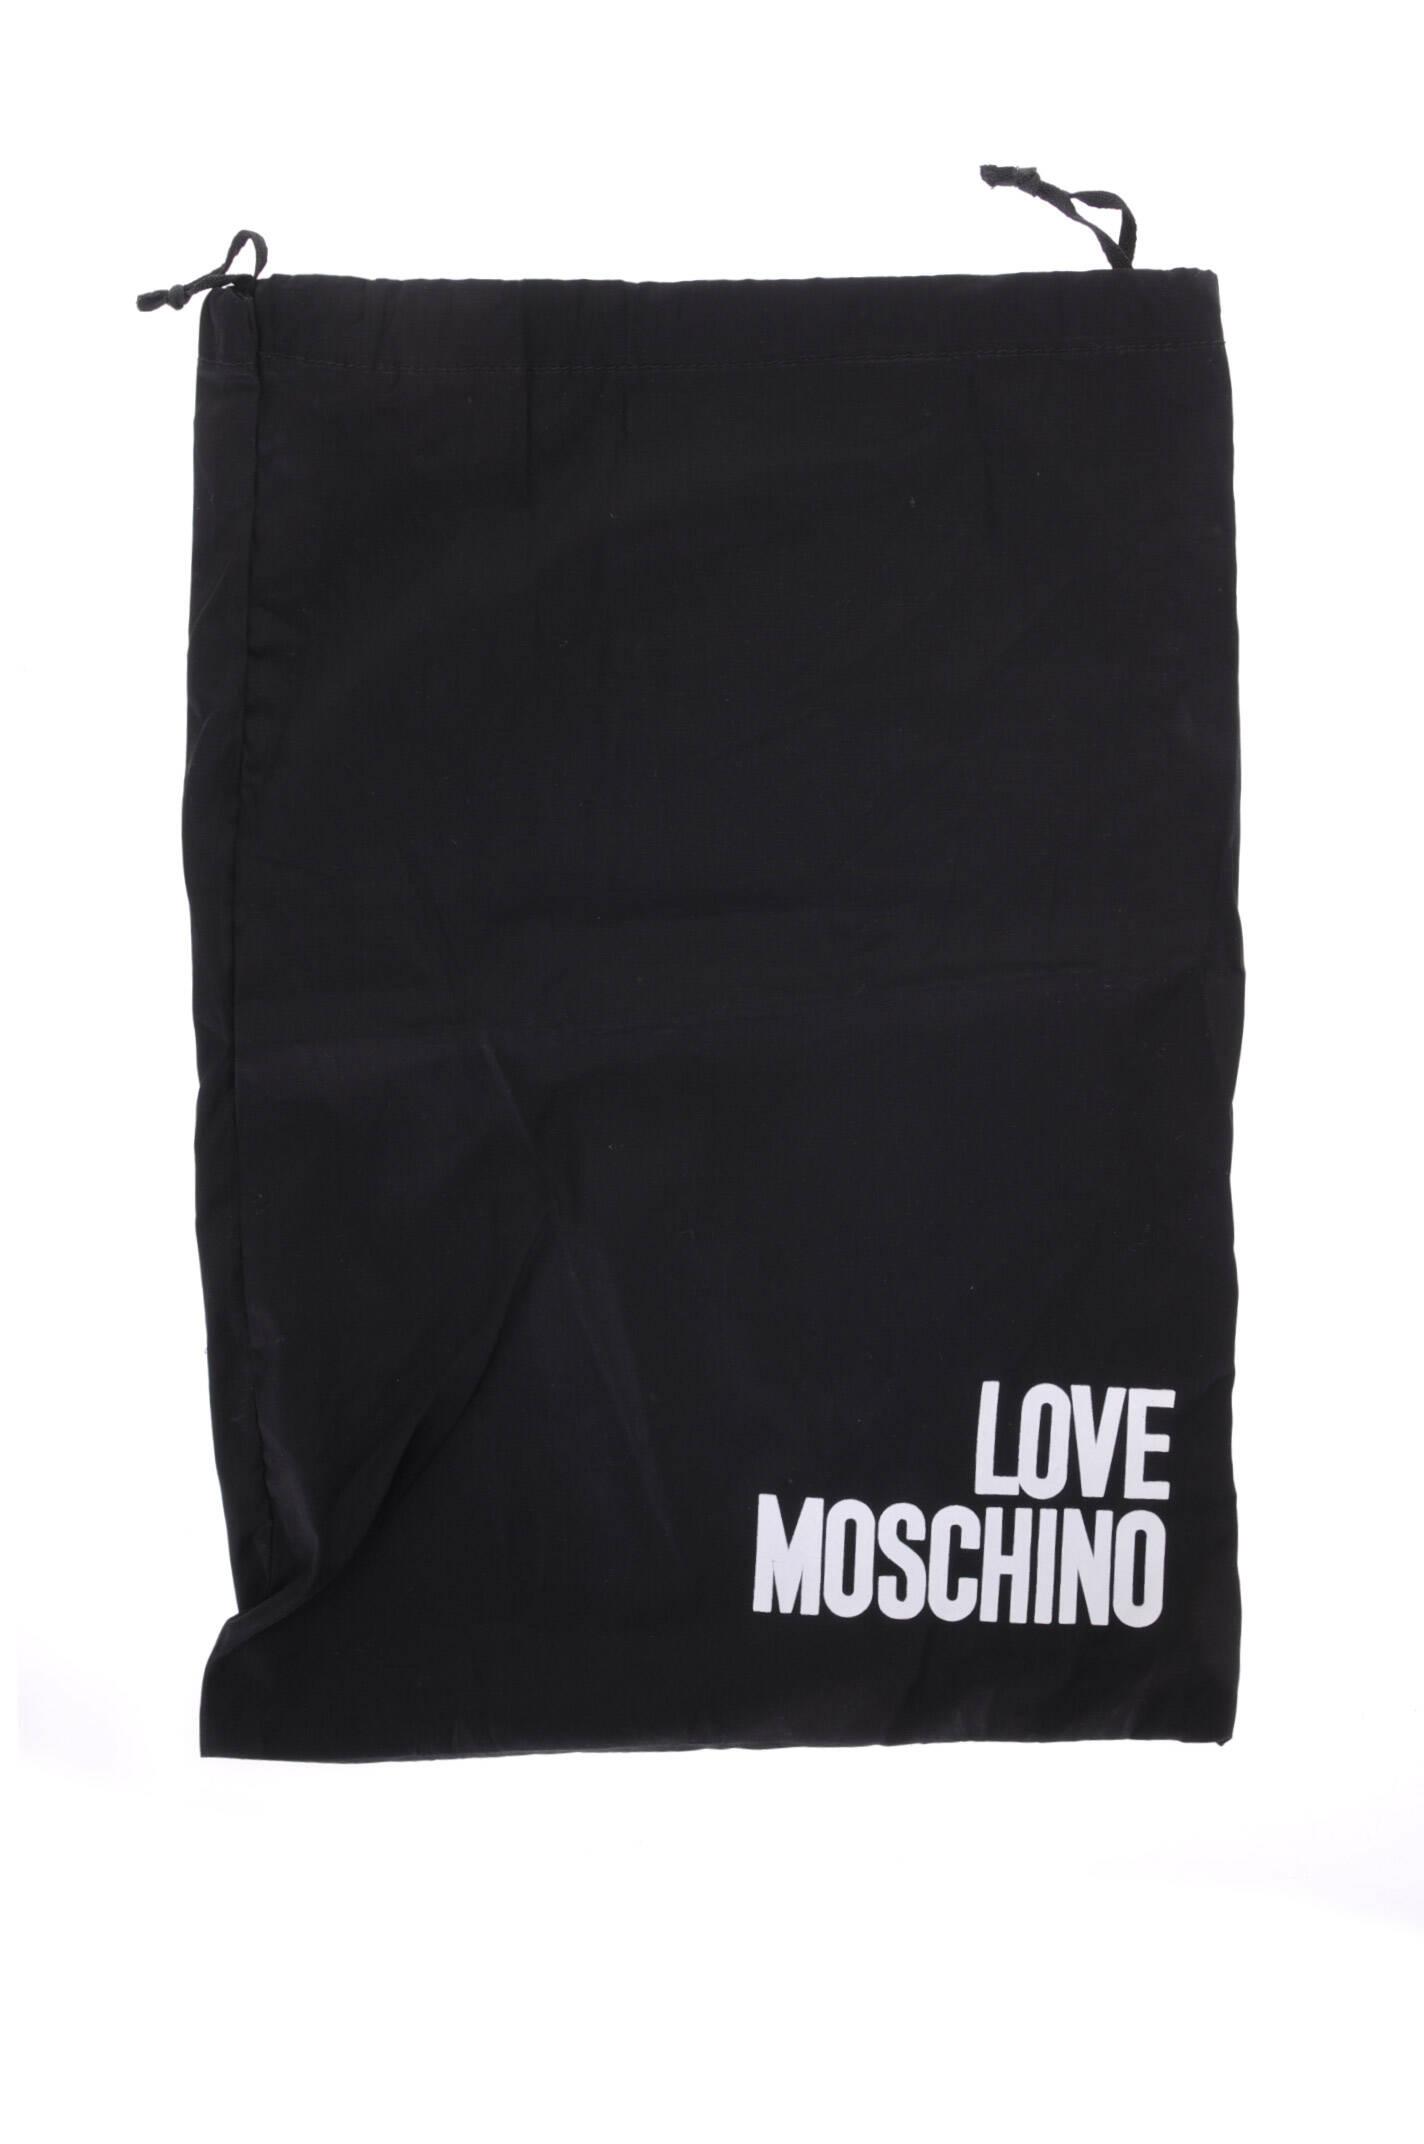 baleriny love moschino niebieski. Black Bedroom Furniture Sets. Home Design Ideas